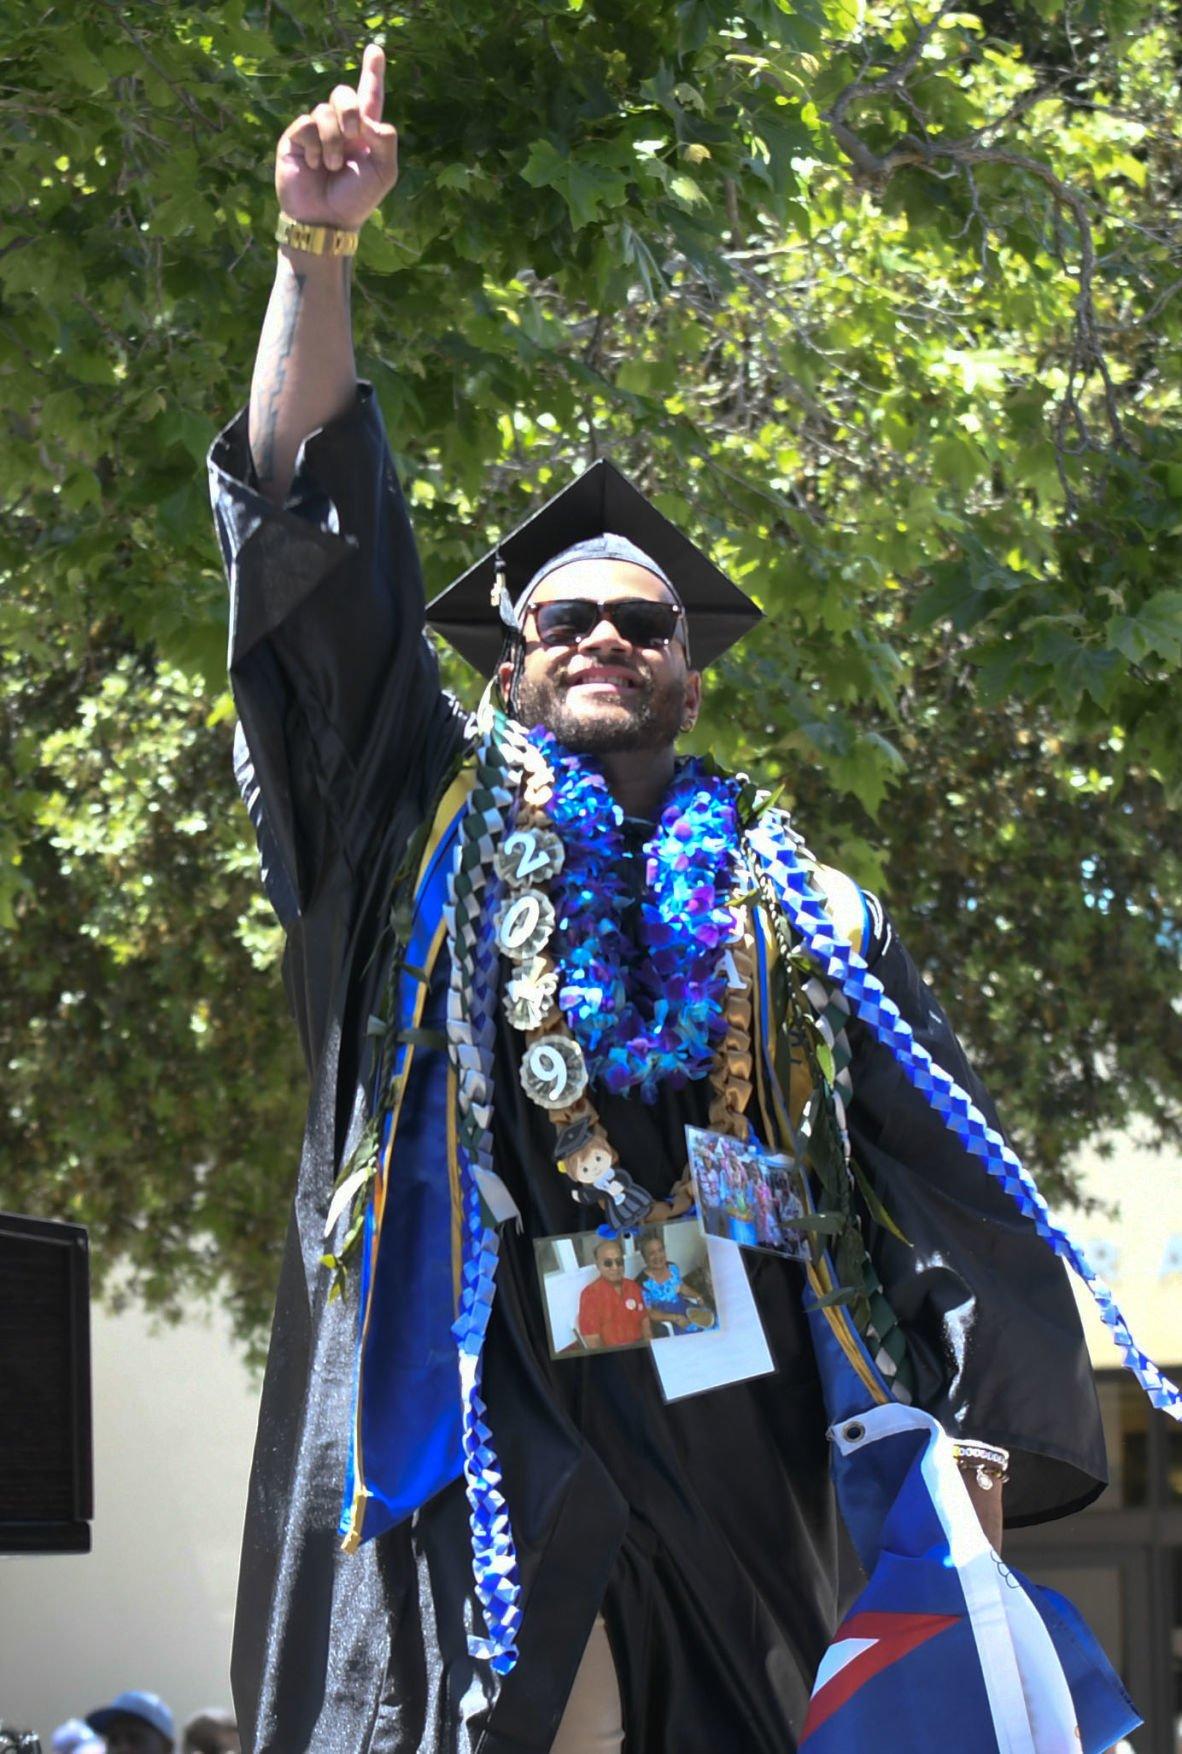 052419 Hancock graduation 02.jpg